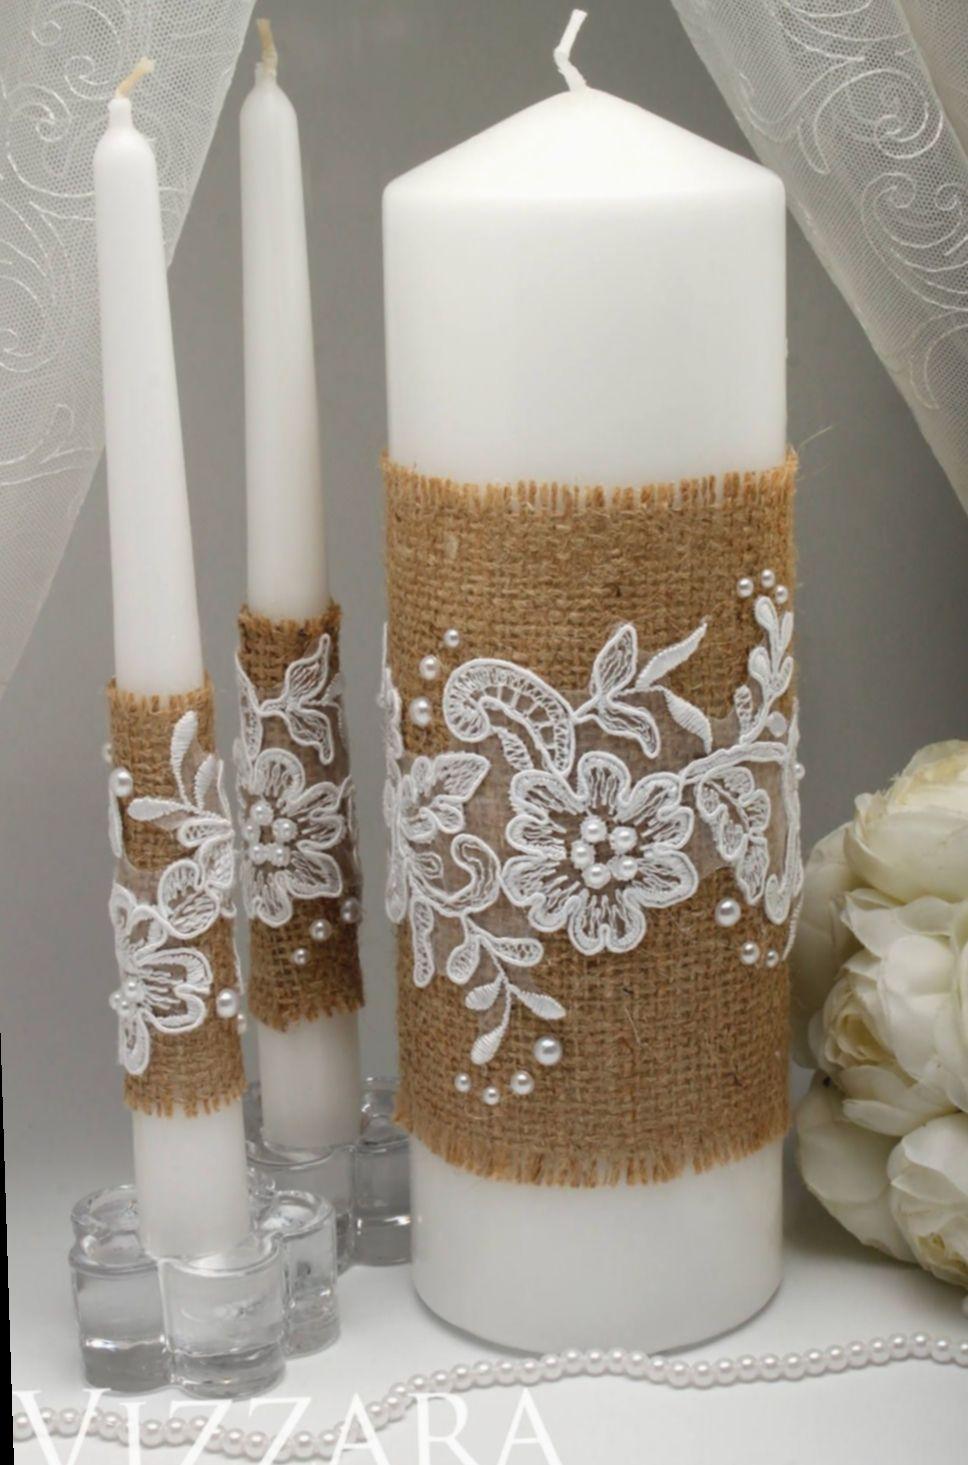 21 Diy Wedding Candles Ceremony Decoration Table Mariage Champetre Bougies Decorees Artisanats Magiques